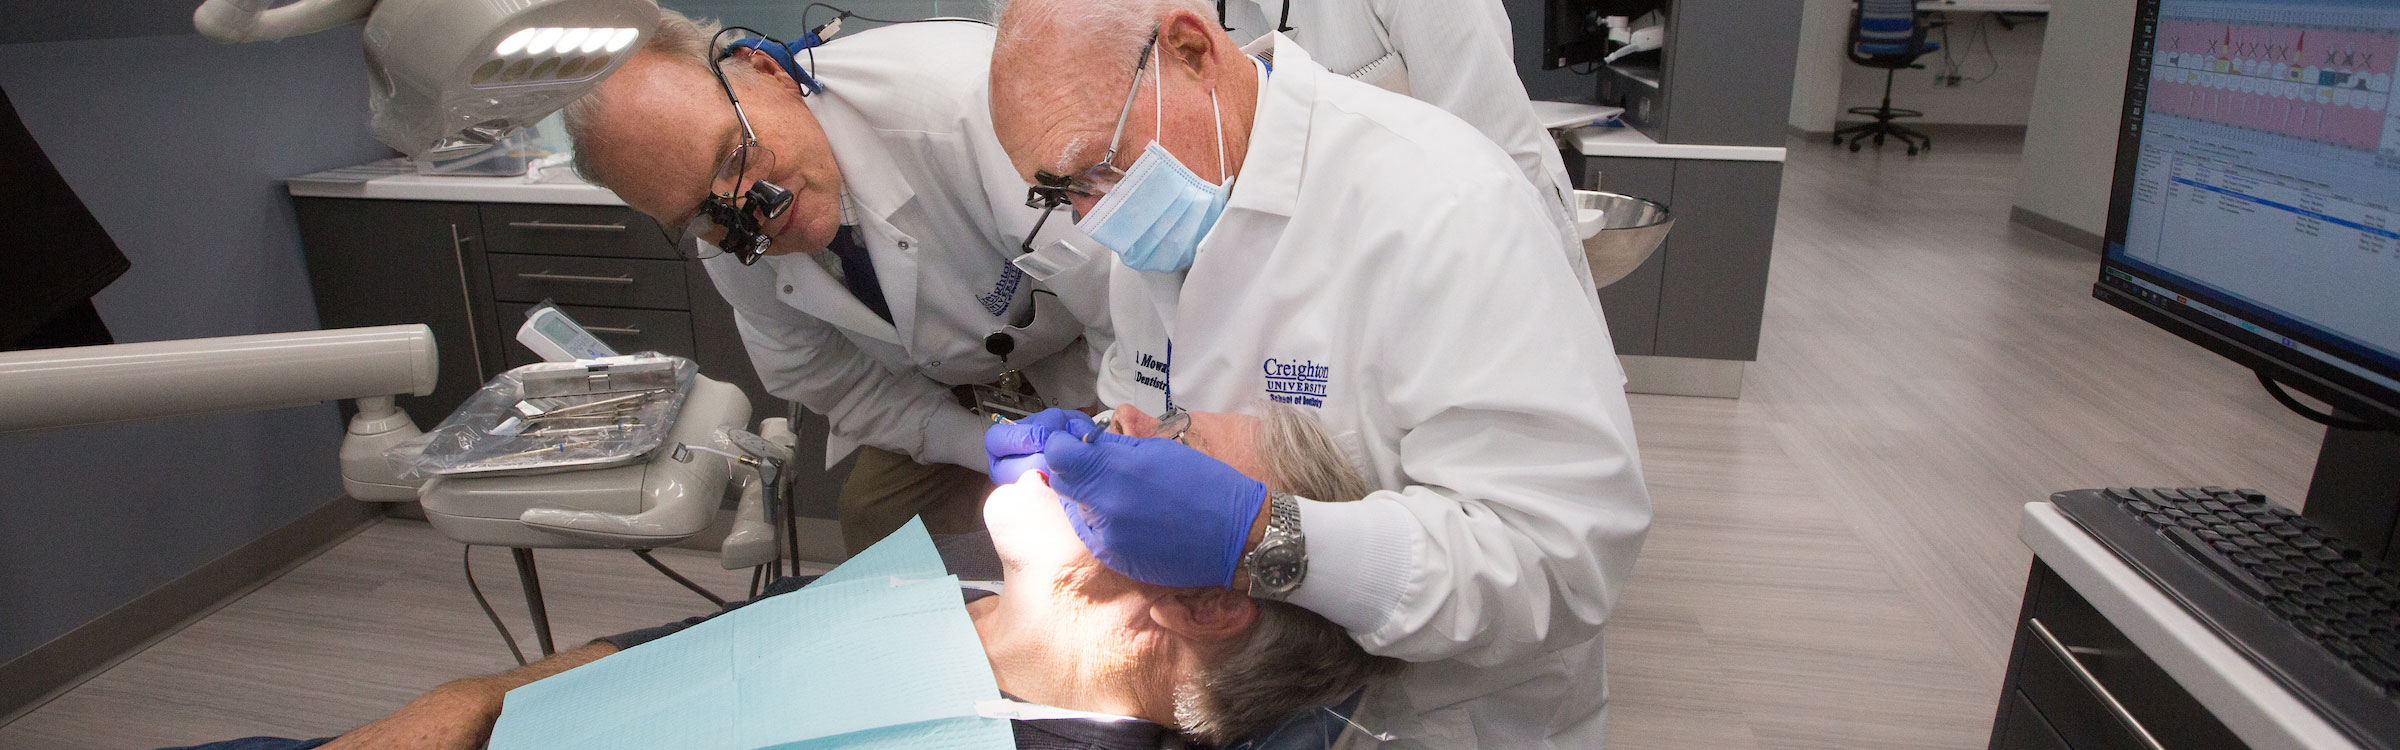 Dentists treating dental patient